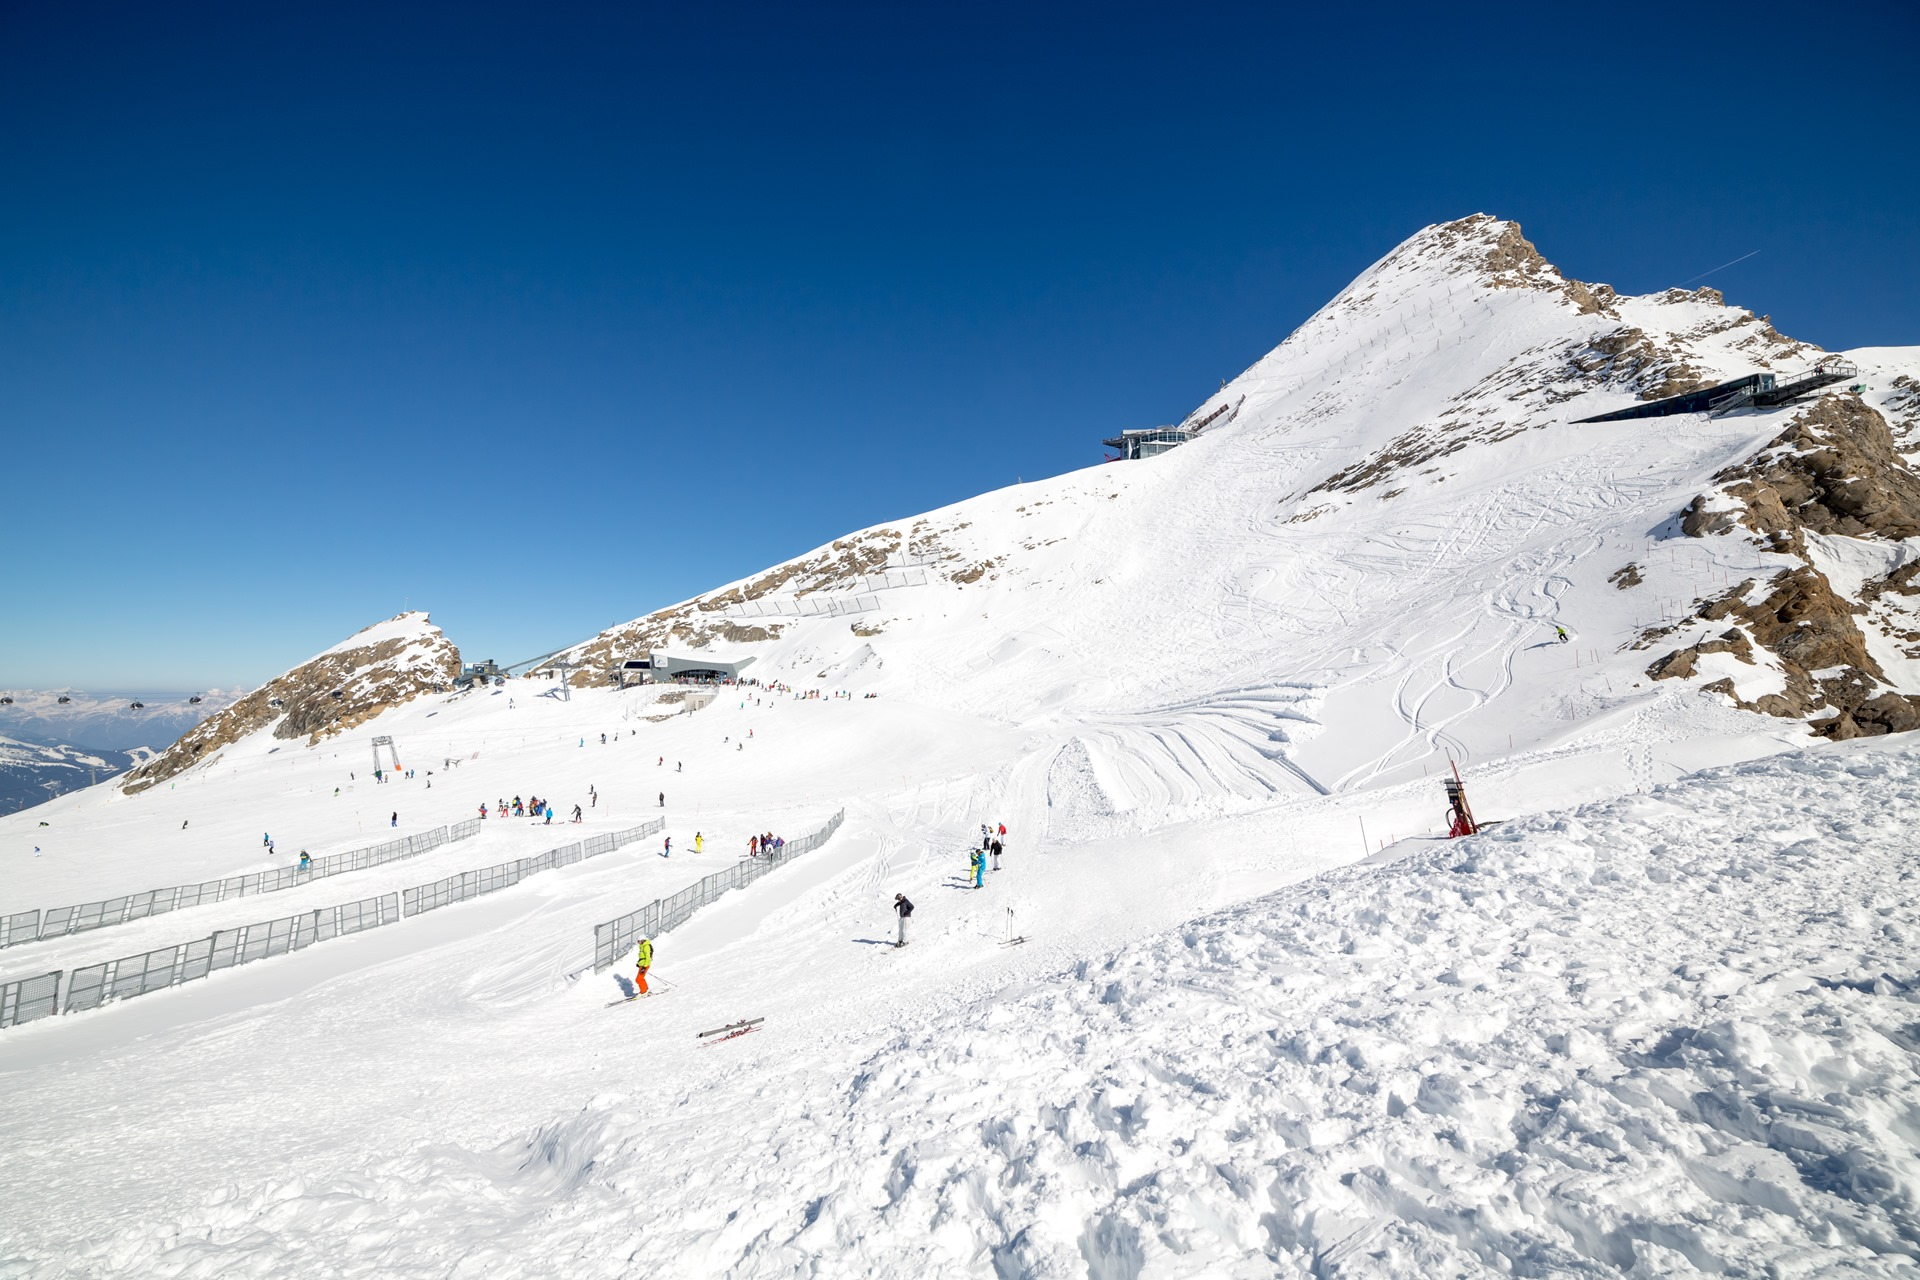 The world's biggest ski areas